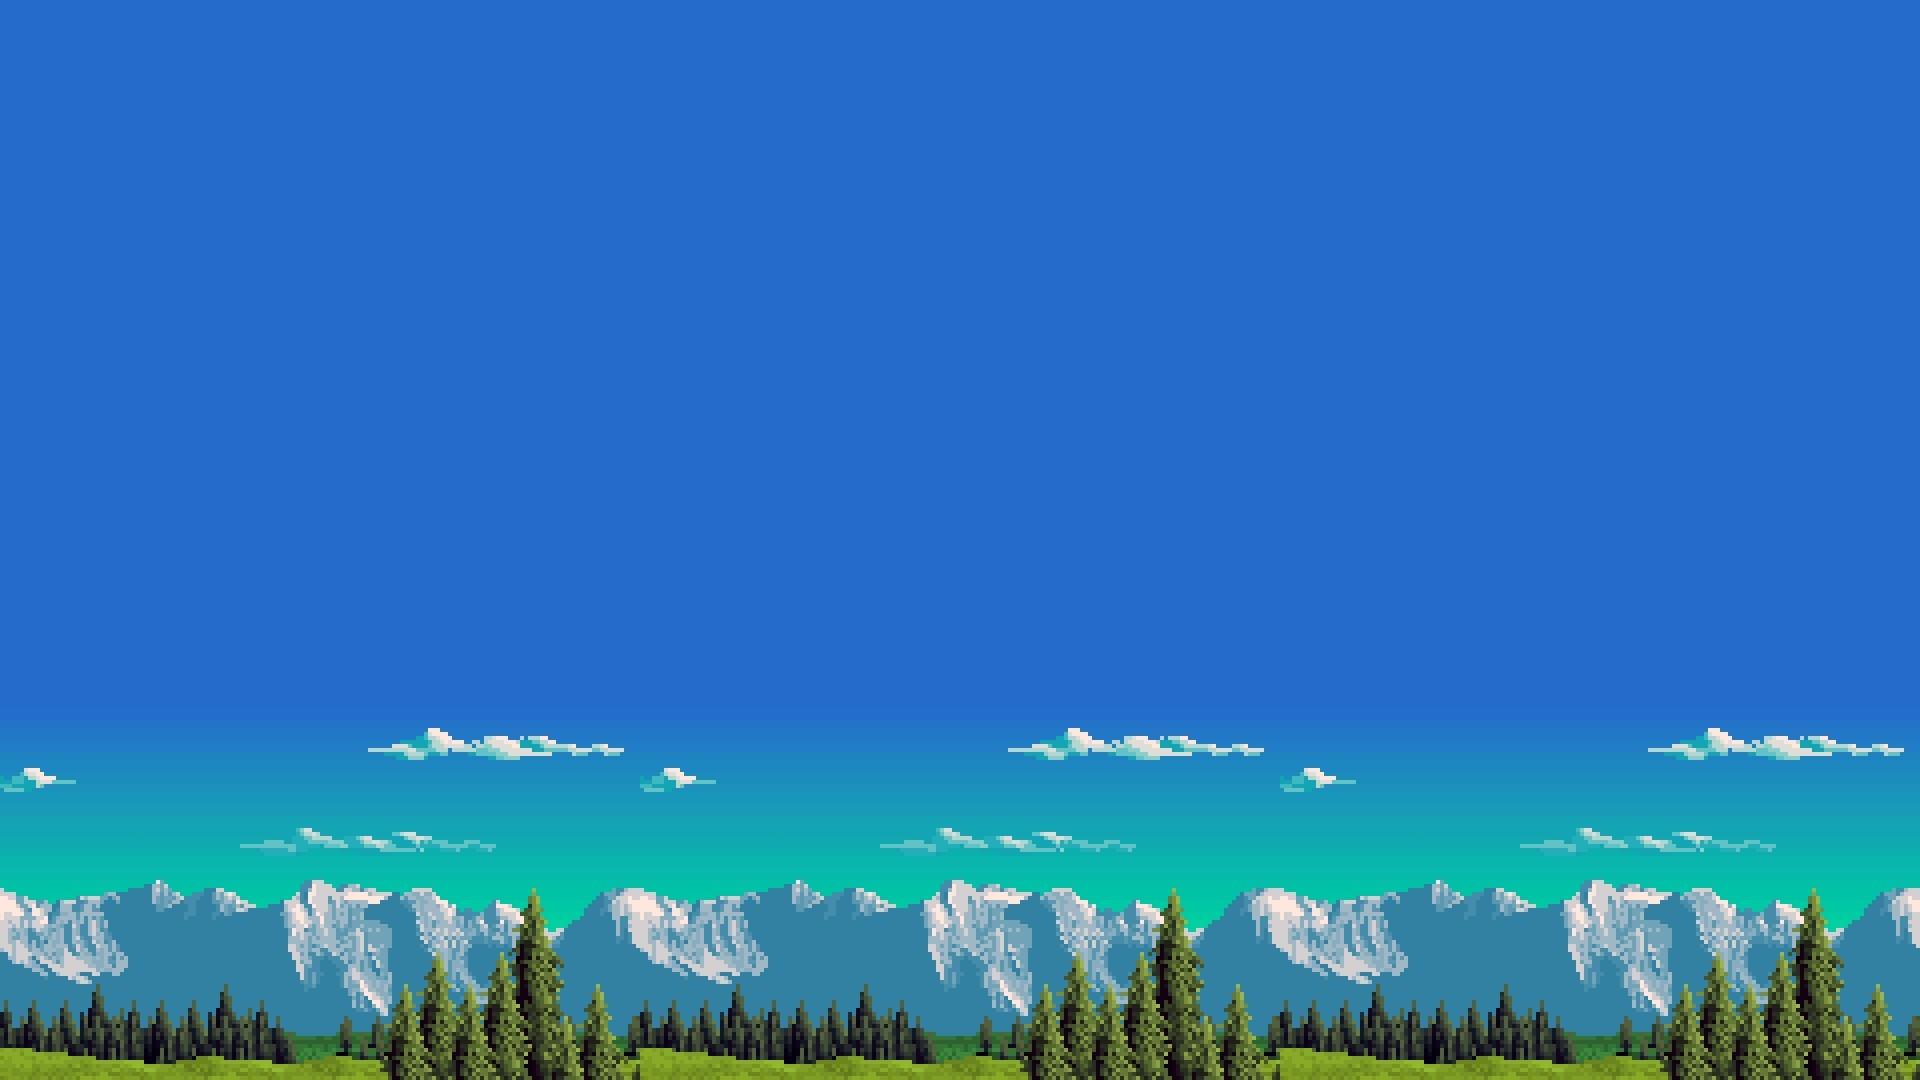 General retro games mountains 8-bit